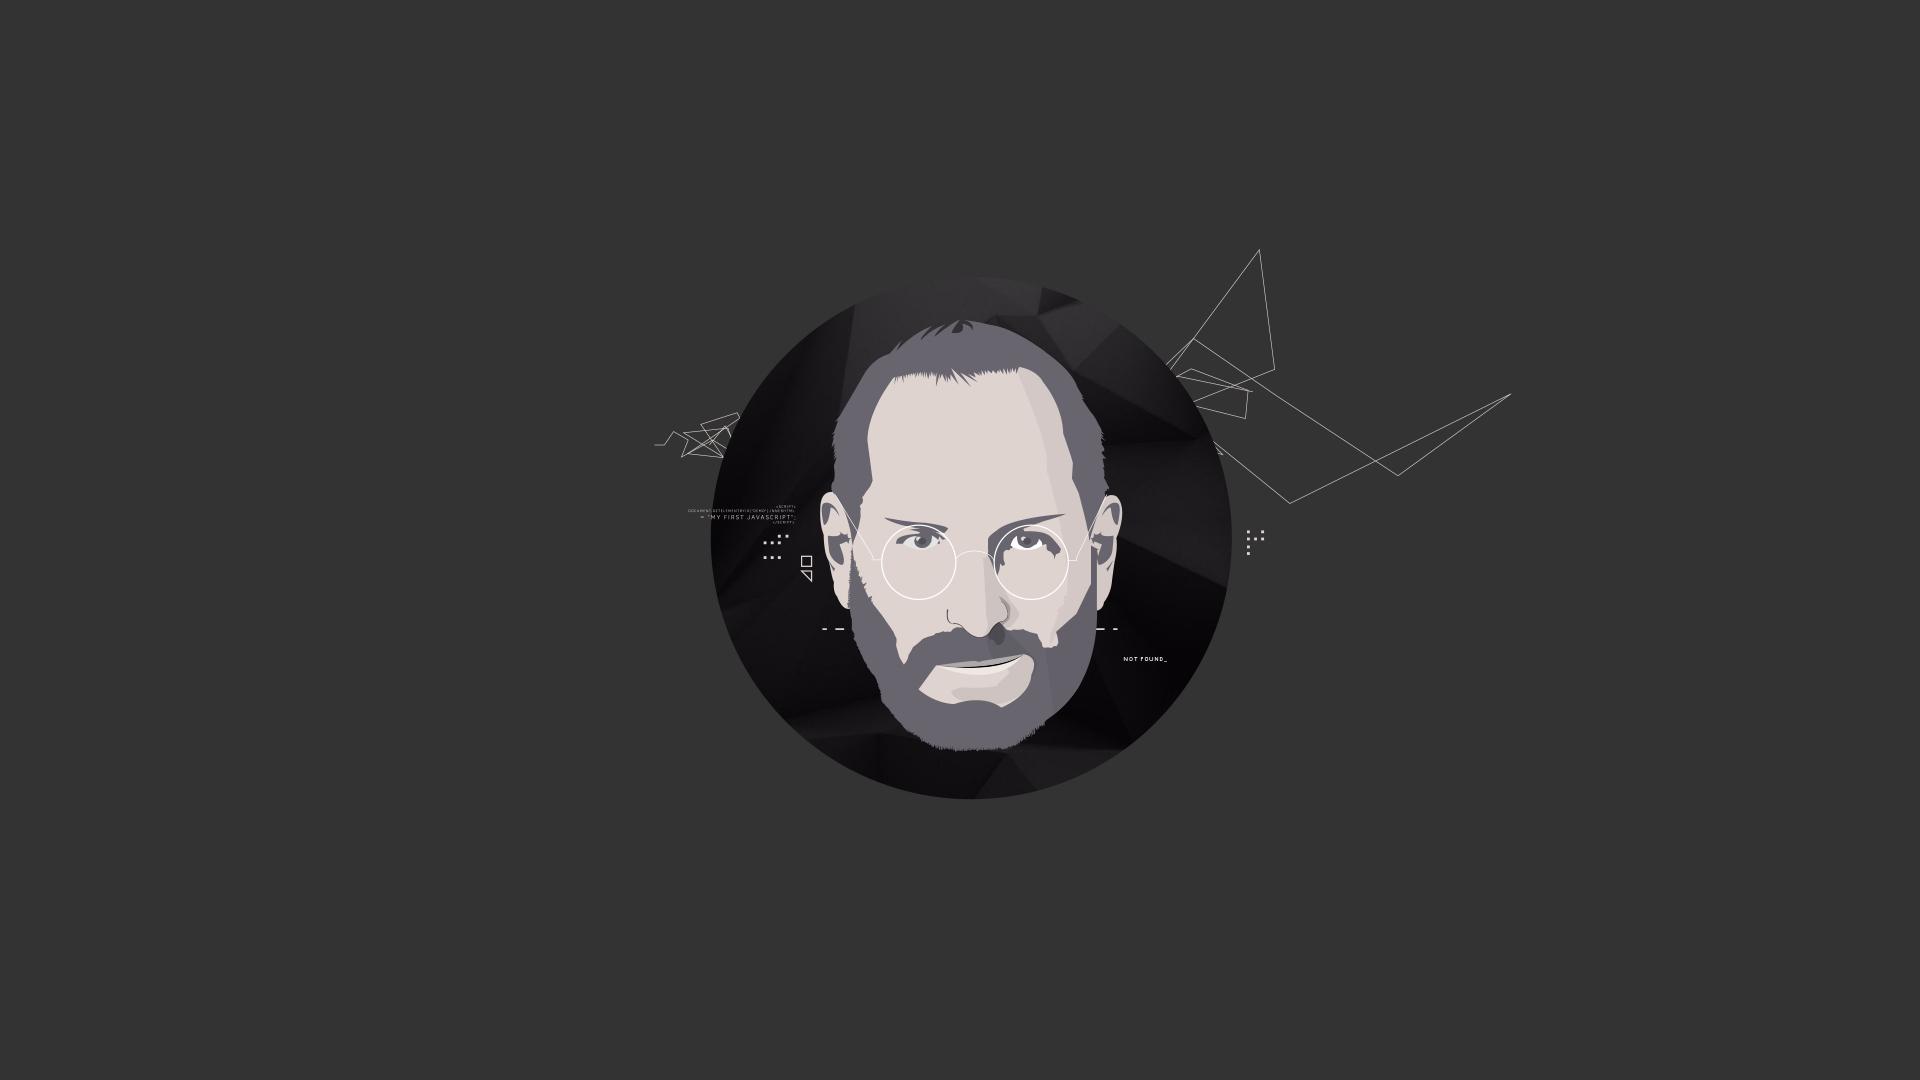 9ac44c701d4 Steve Jobs, la historia del hippie visionario